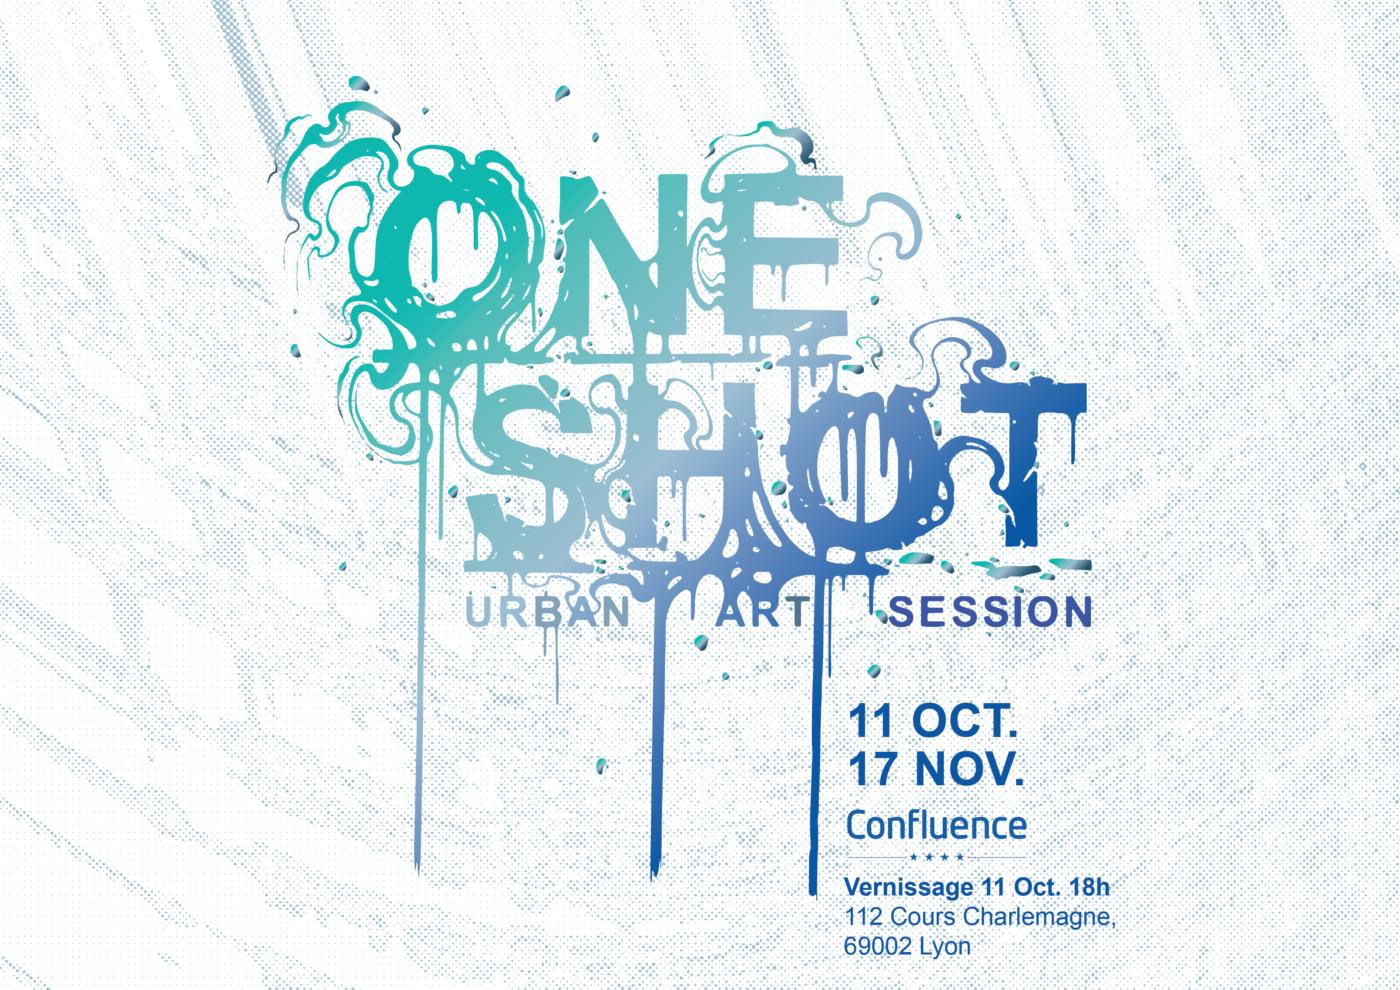 visuel_one_shot-1400x990